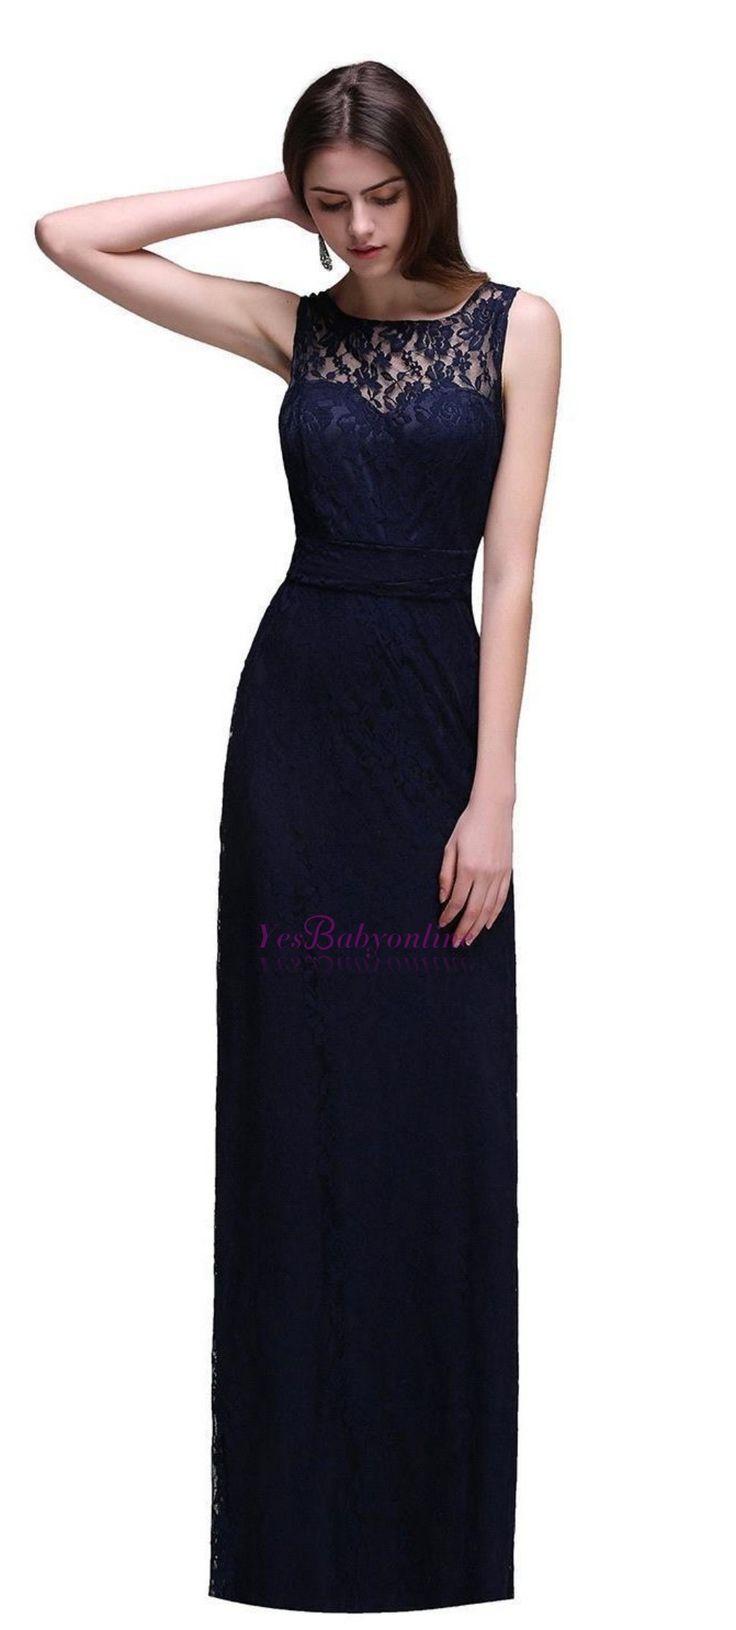 Best 25+ Navy lace bridesmaid dress ideas on Pinterest ...